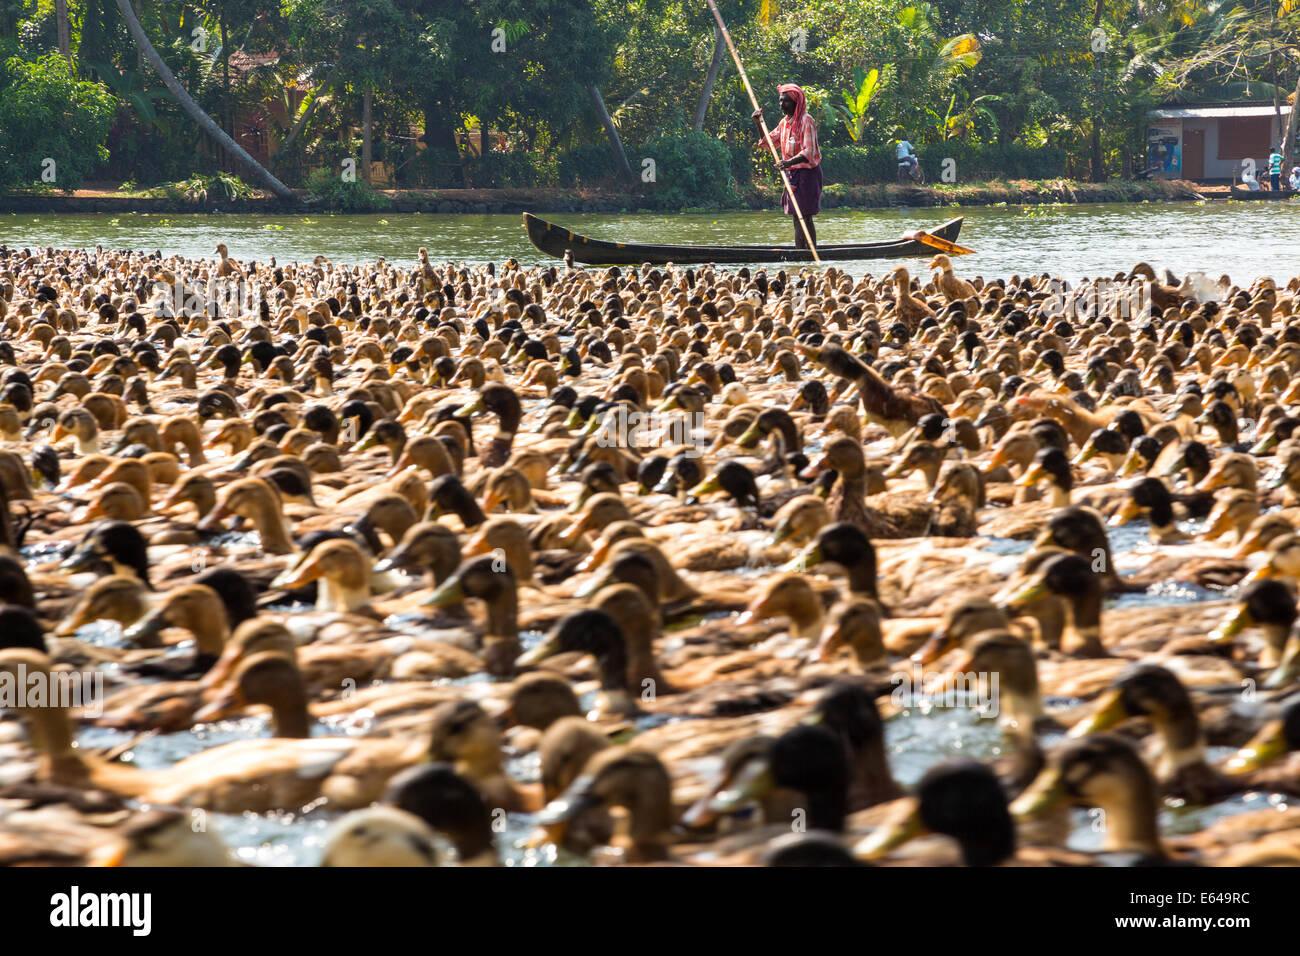 Anatre essendo herded lungo la via navigabile, Kerala backwaters, nr Alleppey, (o Alappuzha), Kerala, India Immagini Stock